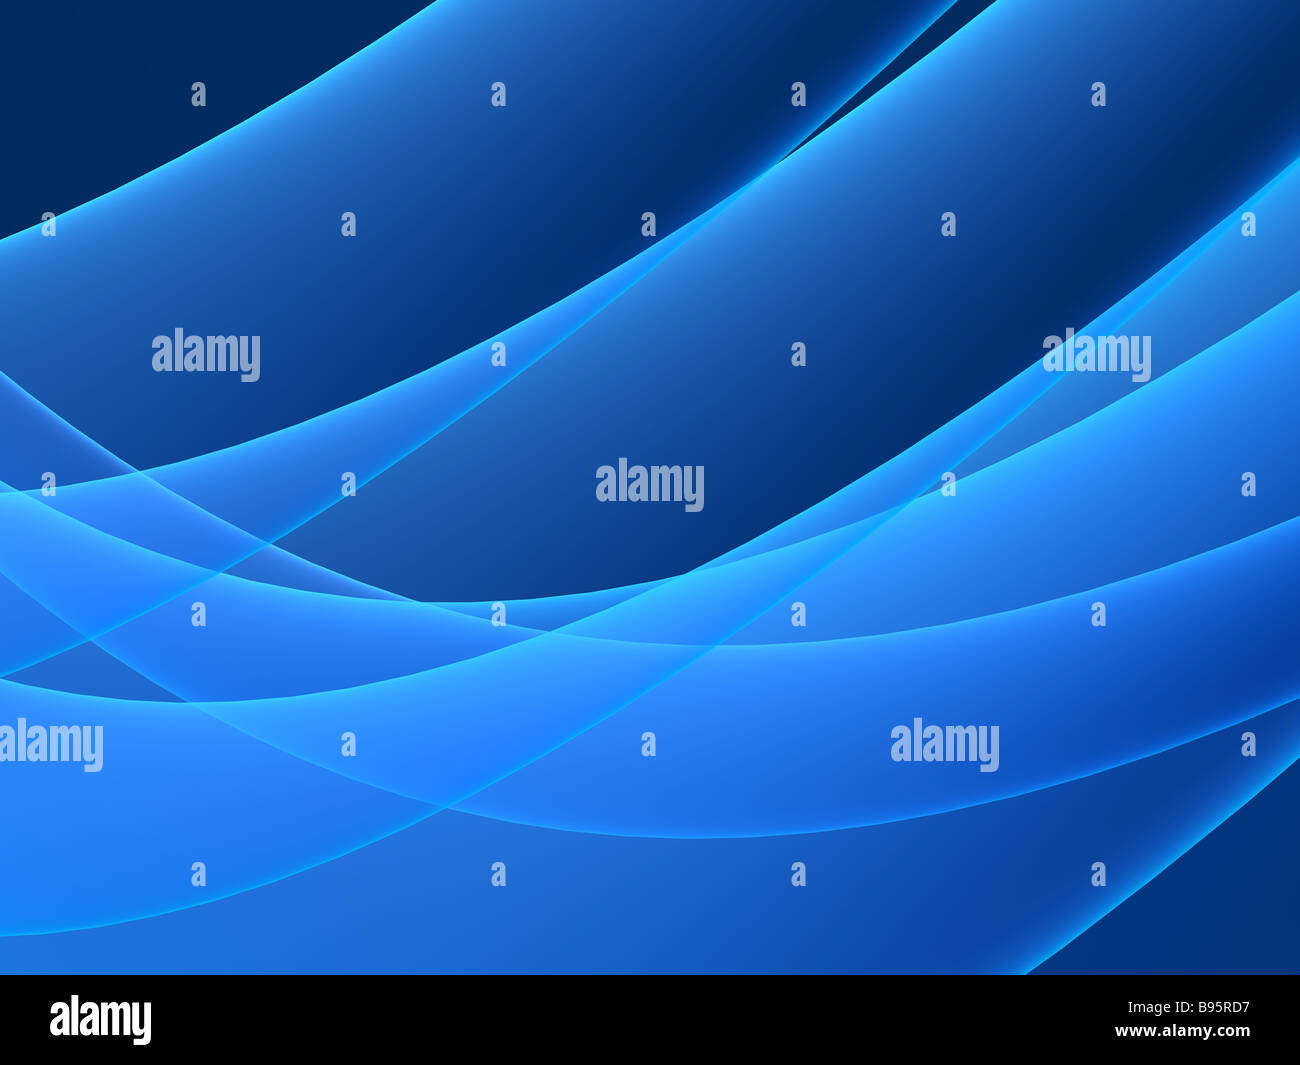 blue shapes - Stock Image